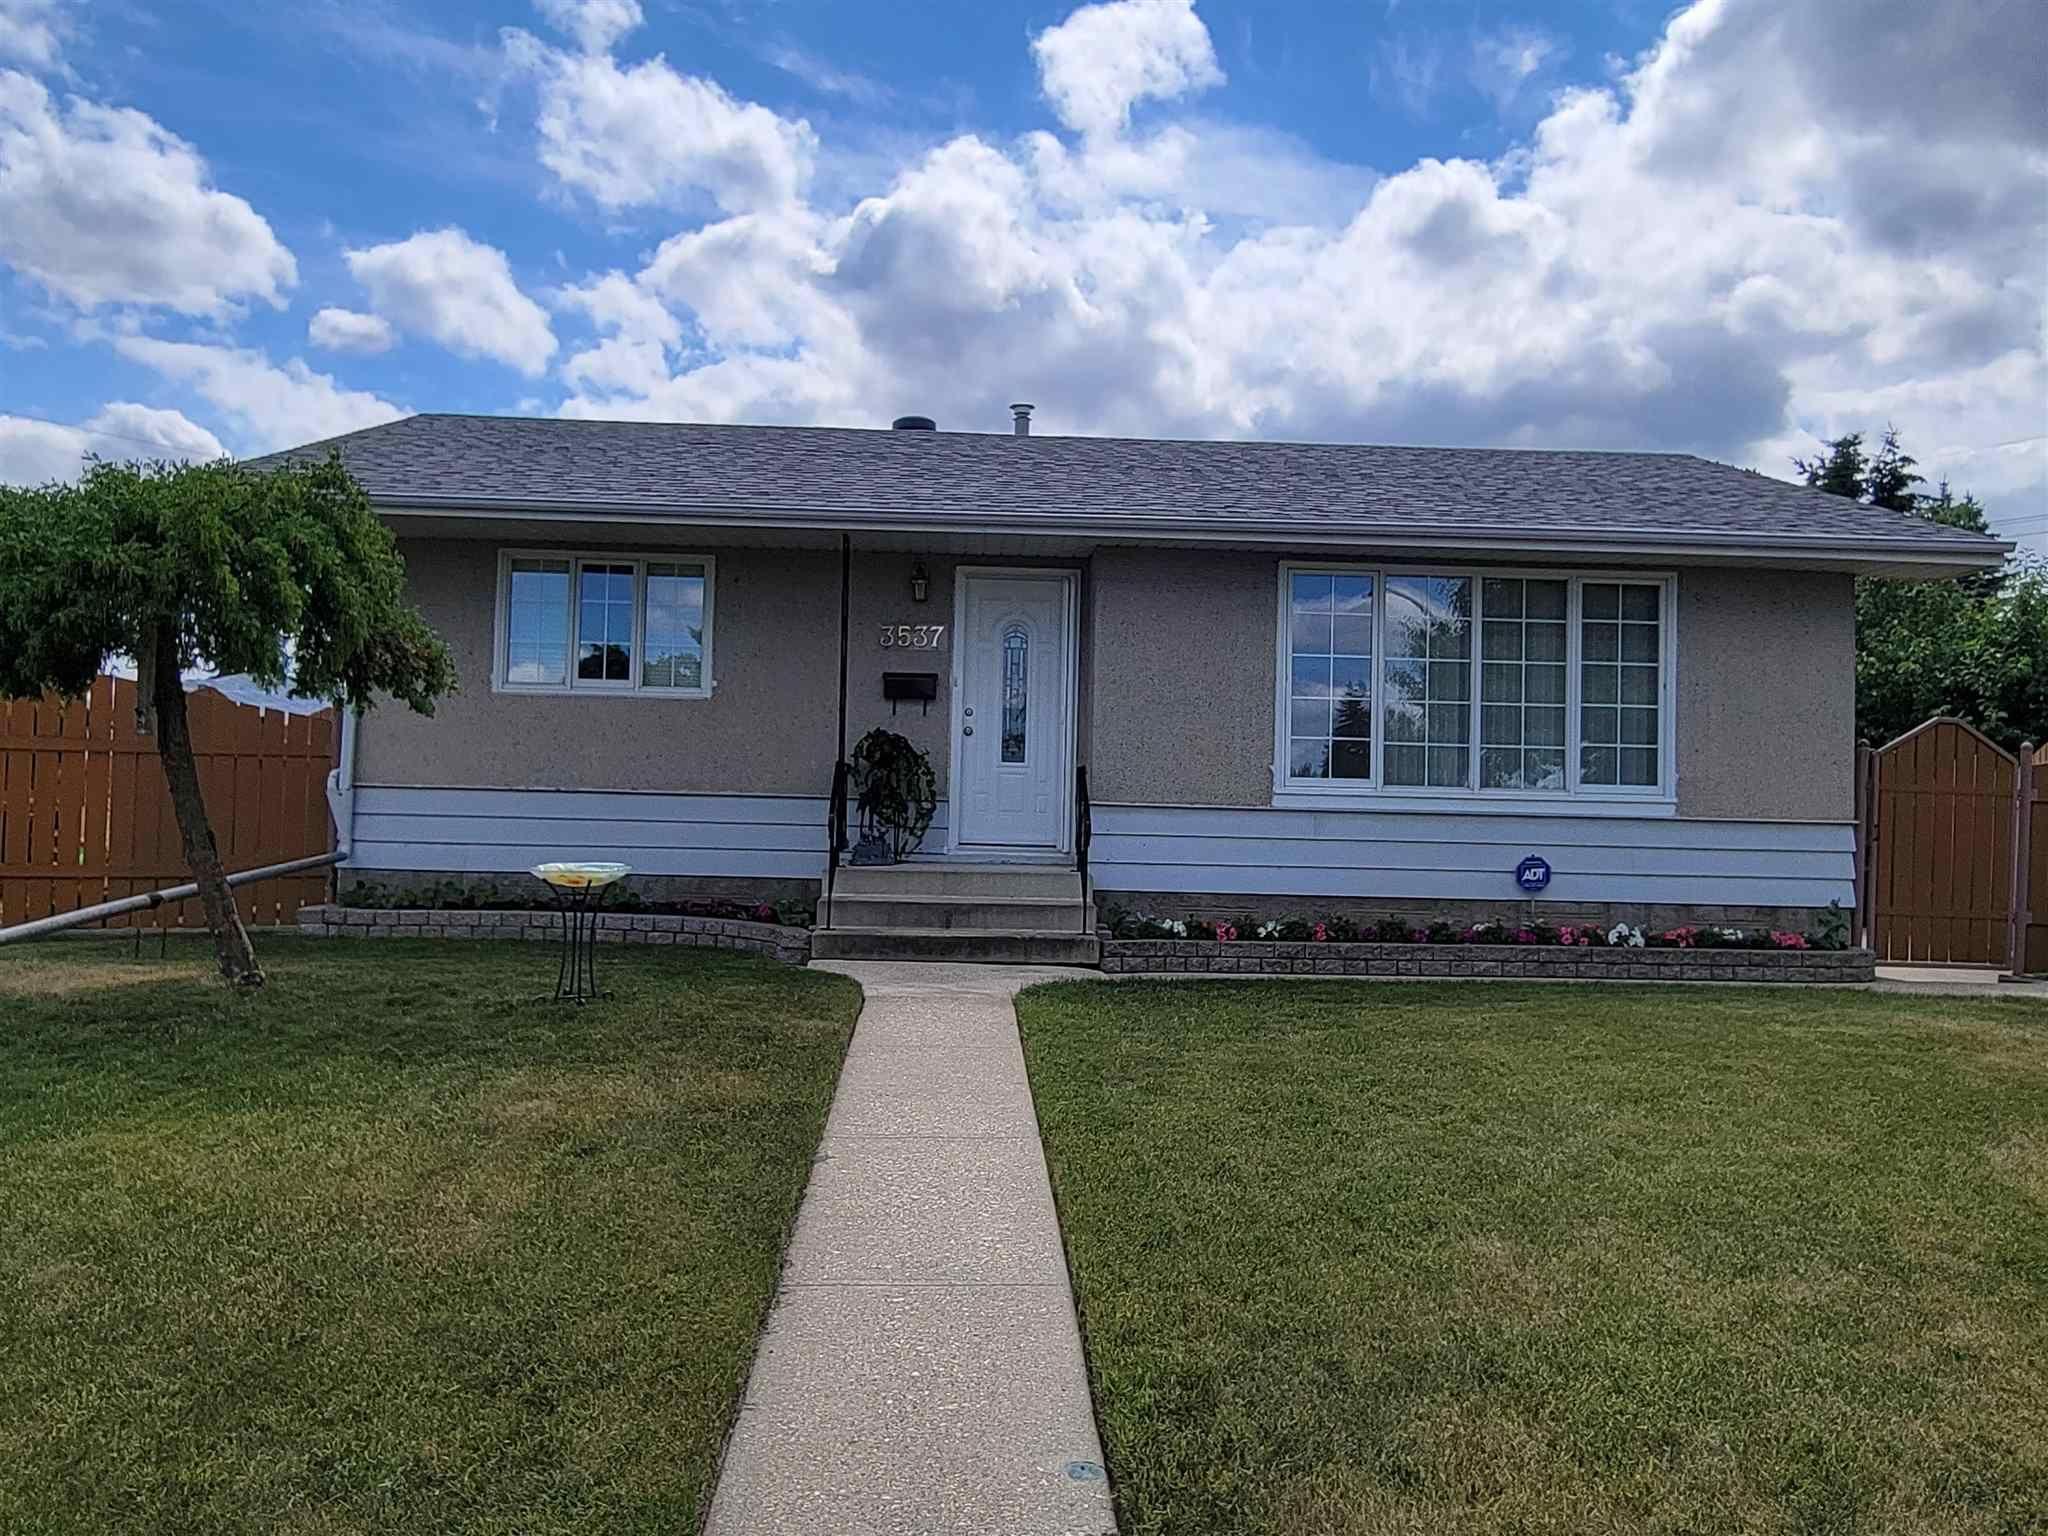 Main Photo: 3537 121A Avenue in Edmonton: Zone 23 House for sale : MLS®# E4253424